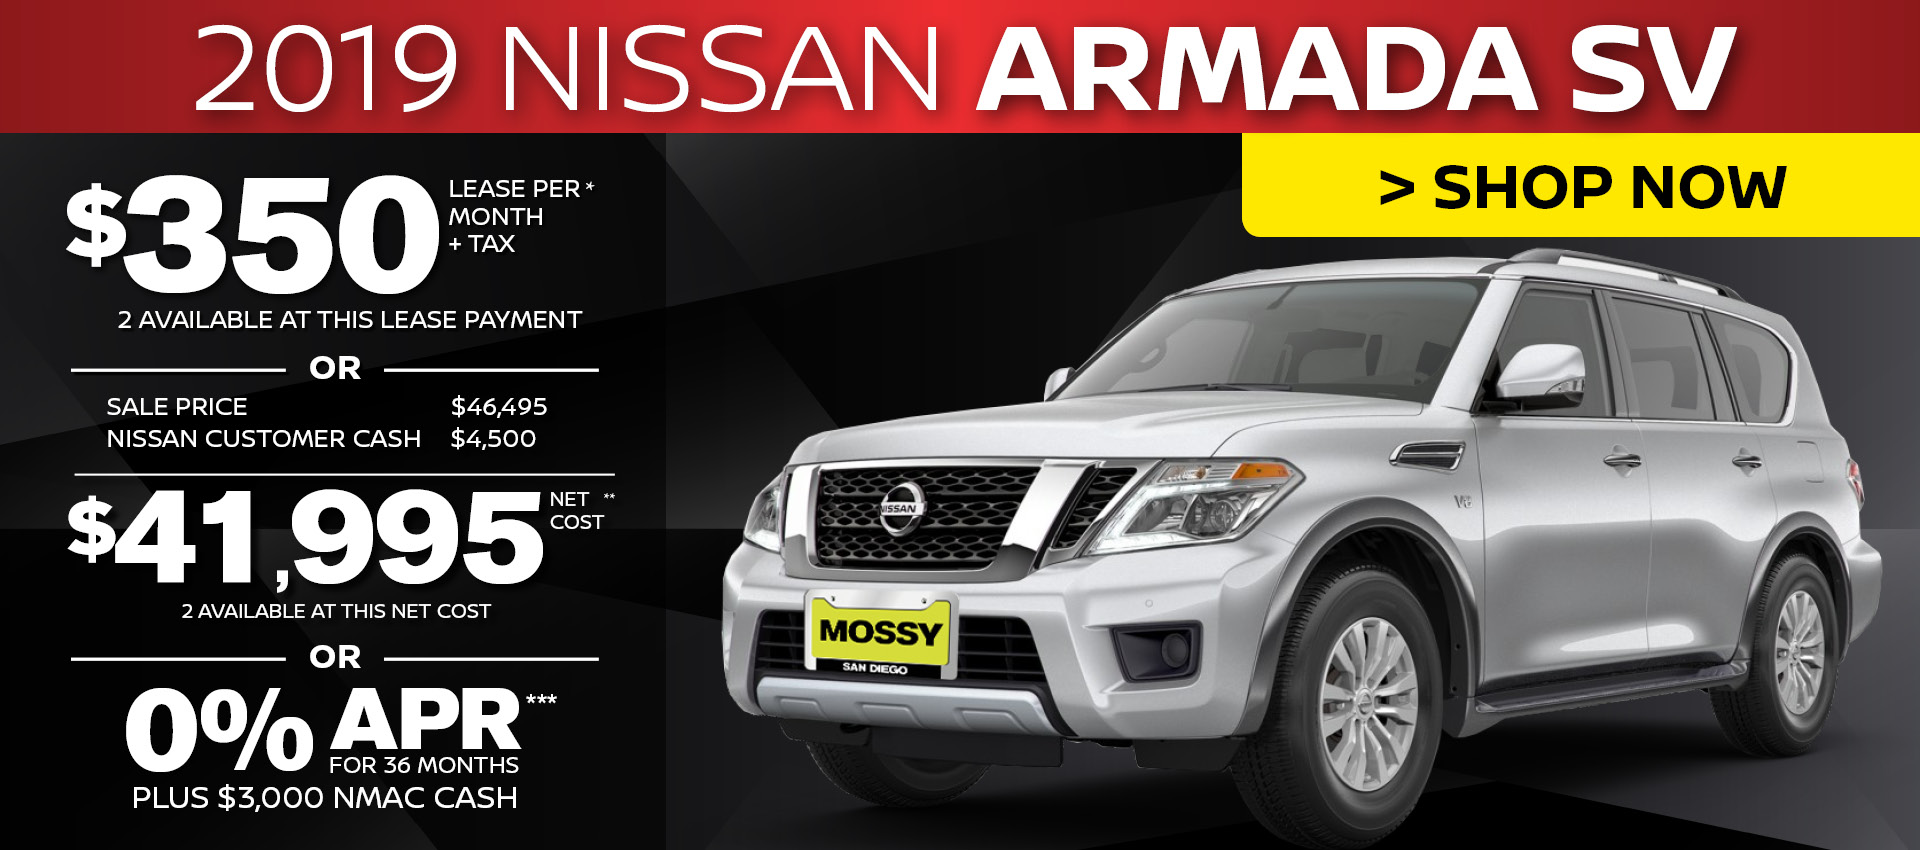 Mossy Nissan - Nissan Armada HP